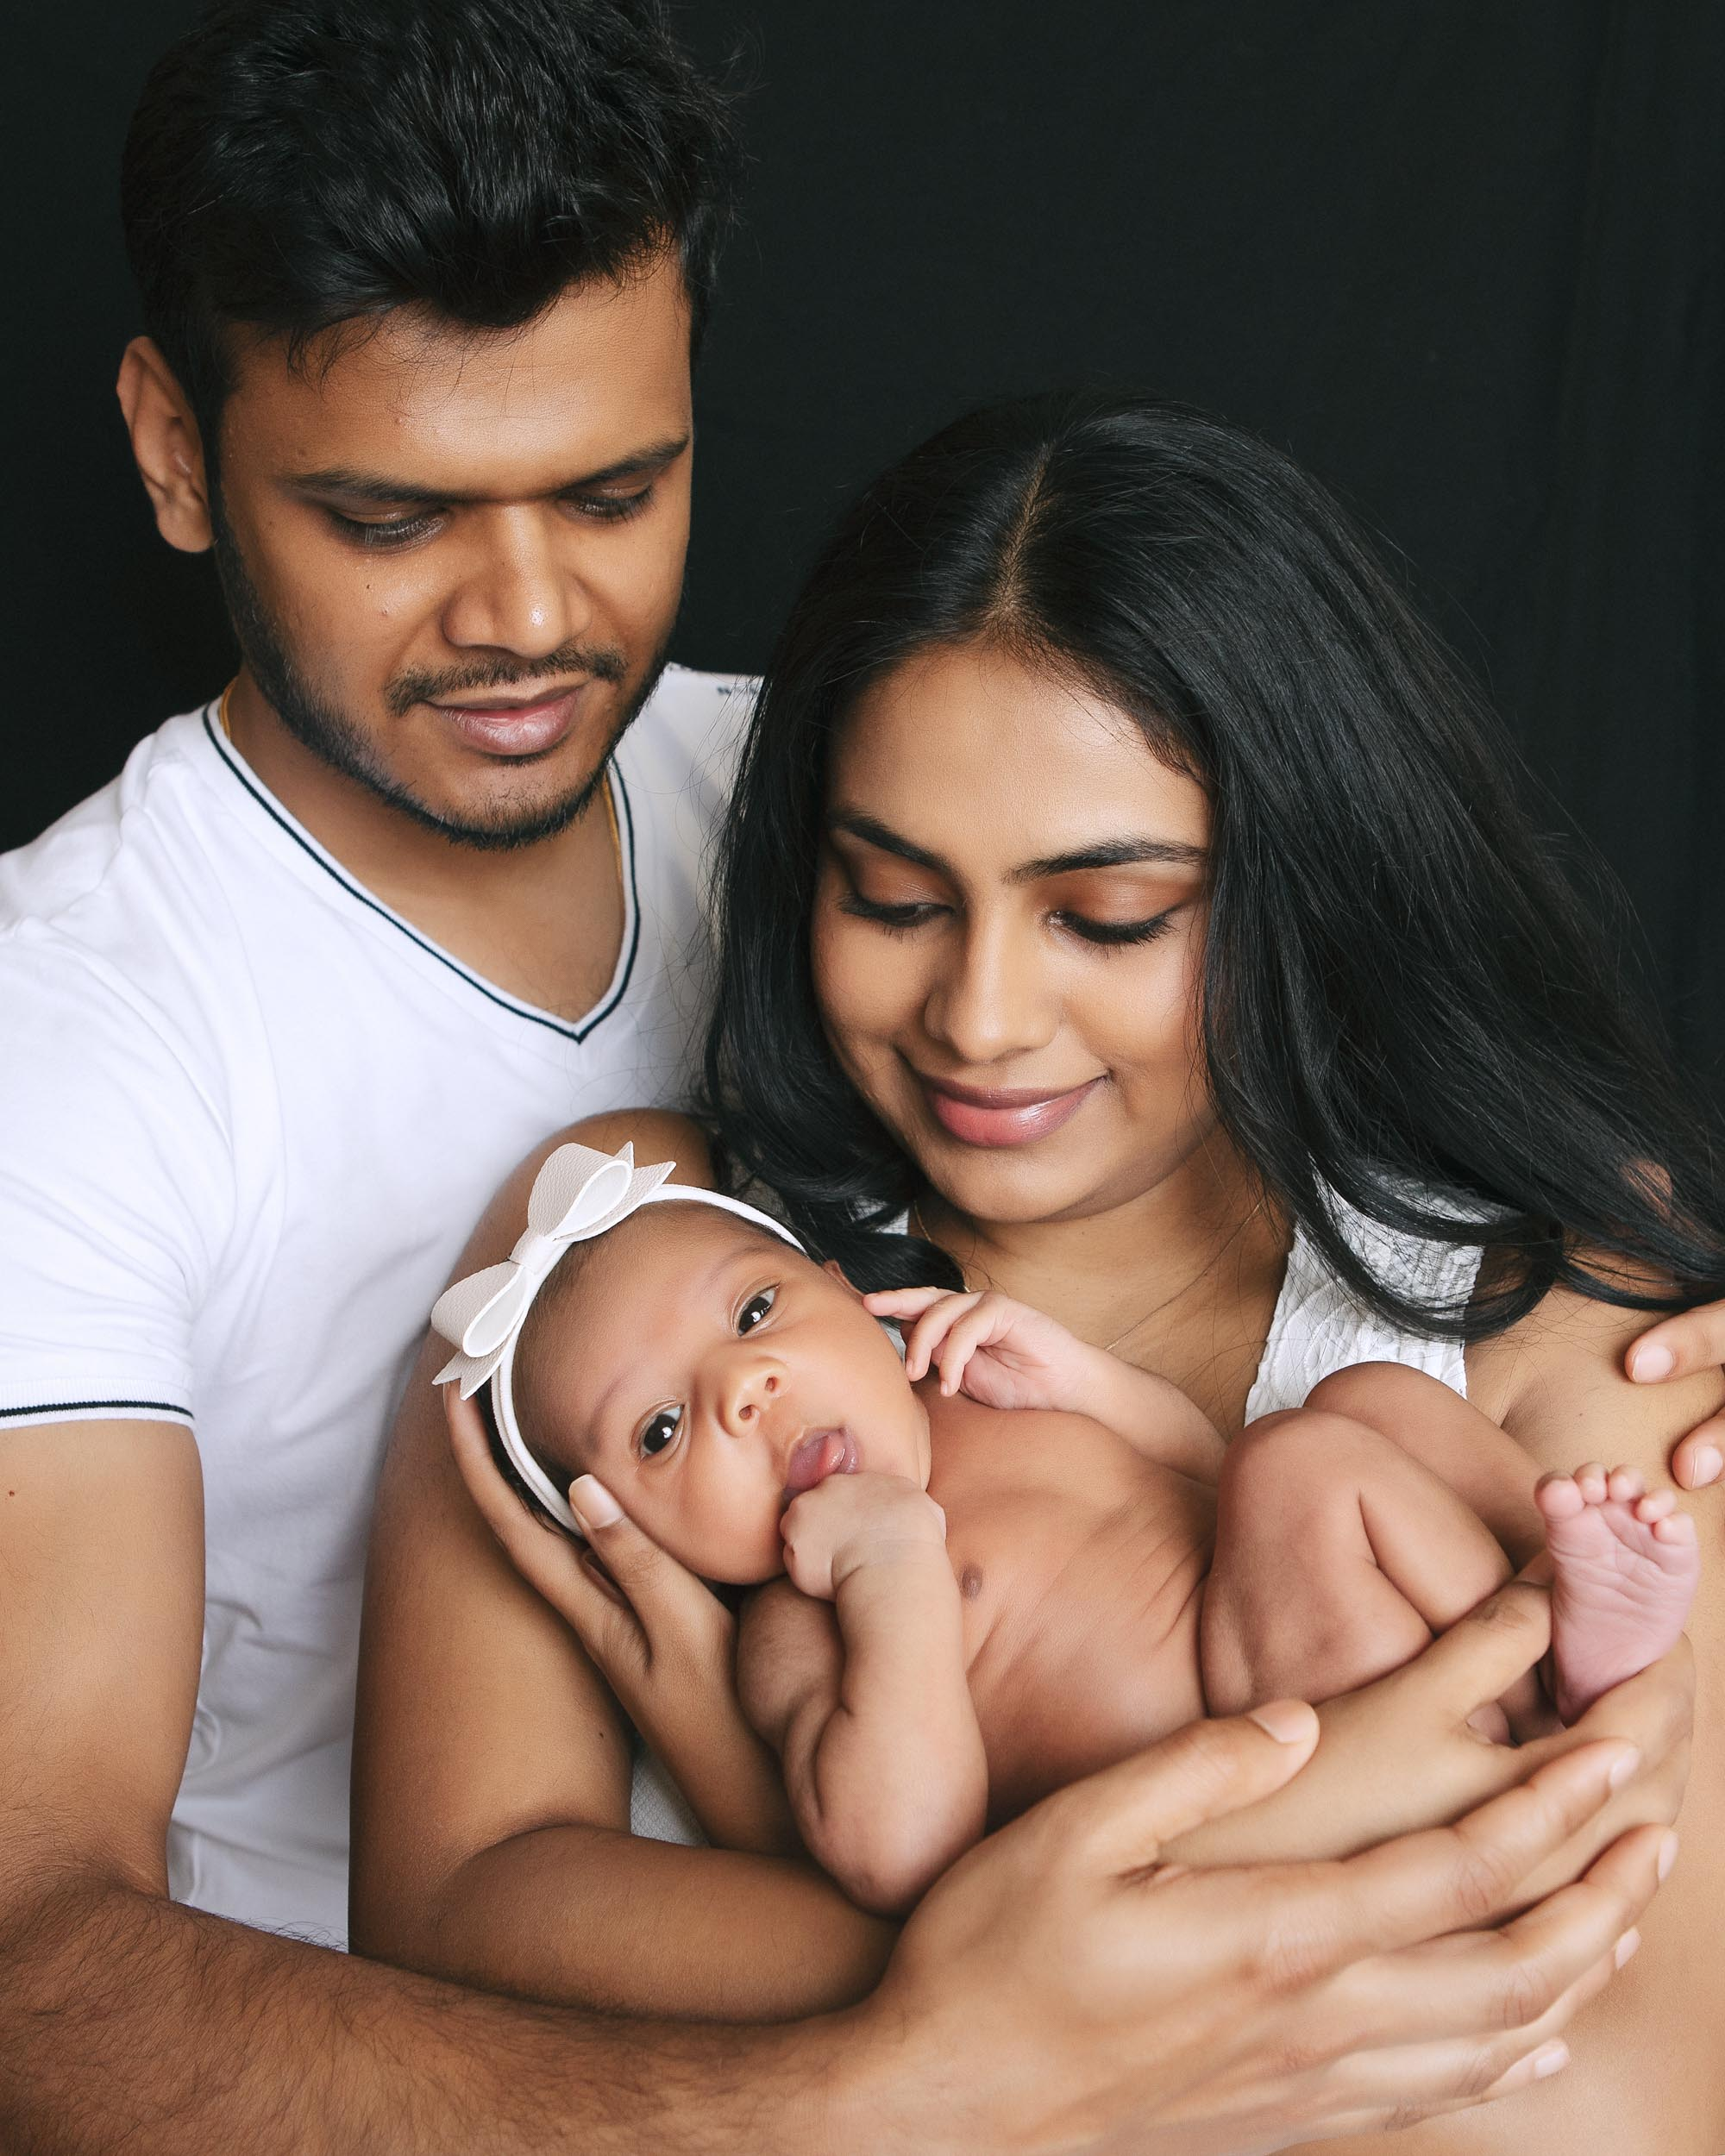 Newborn and family photograph